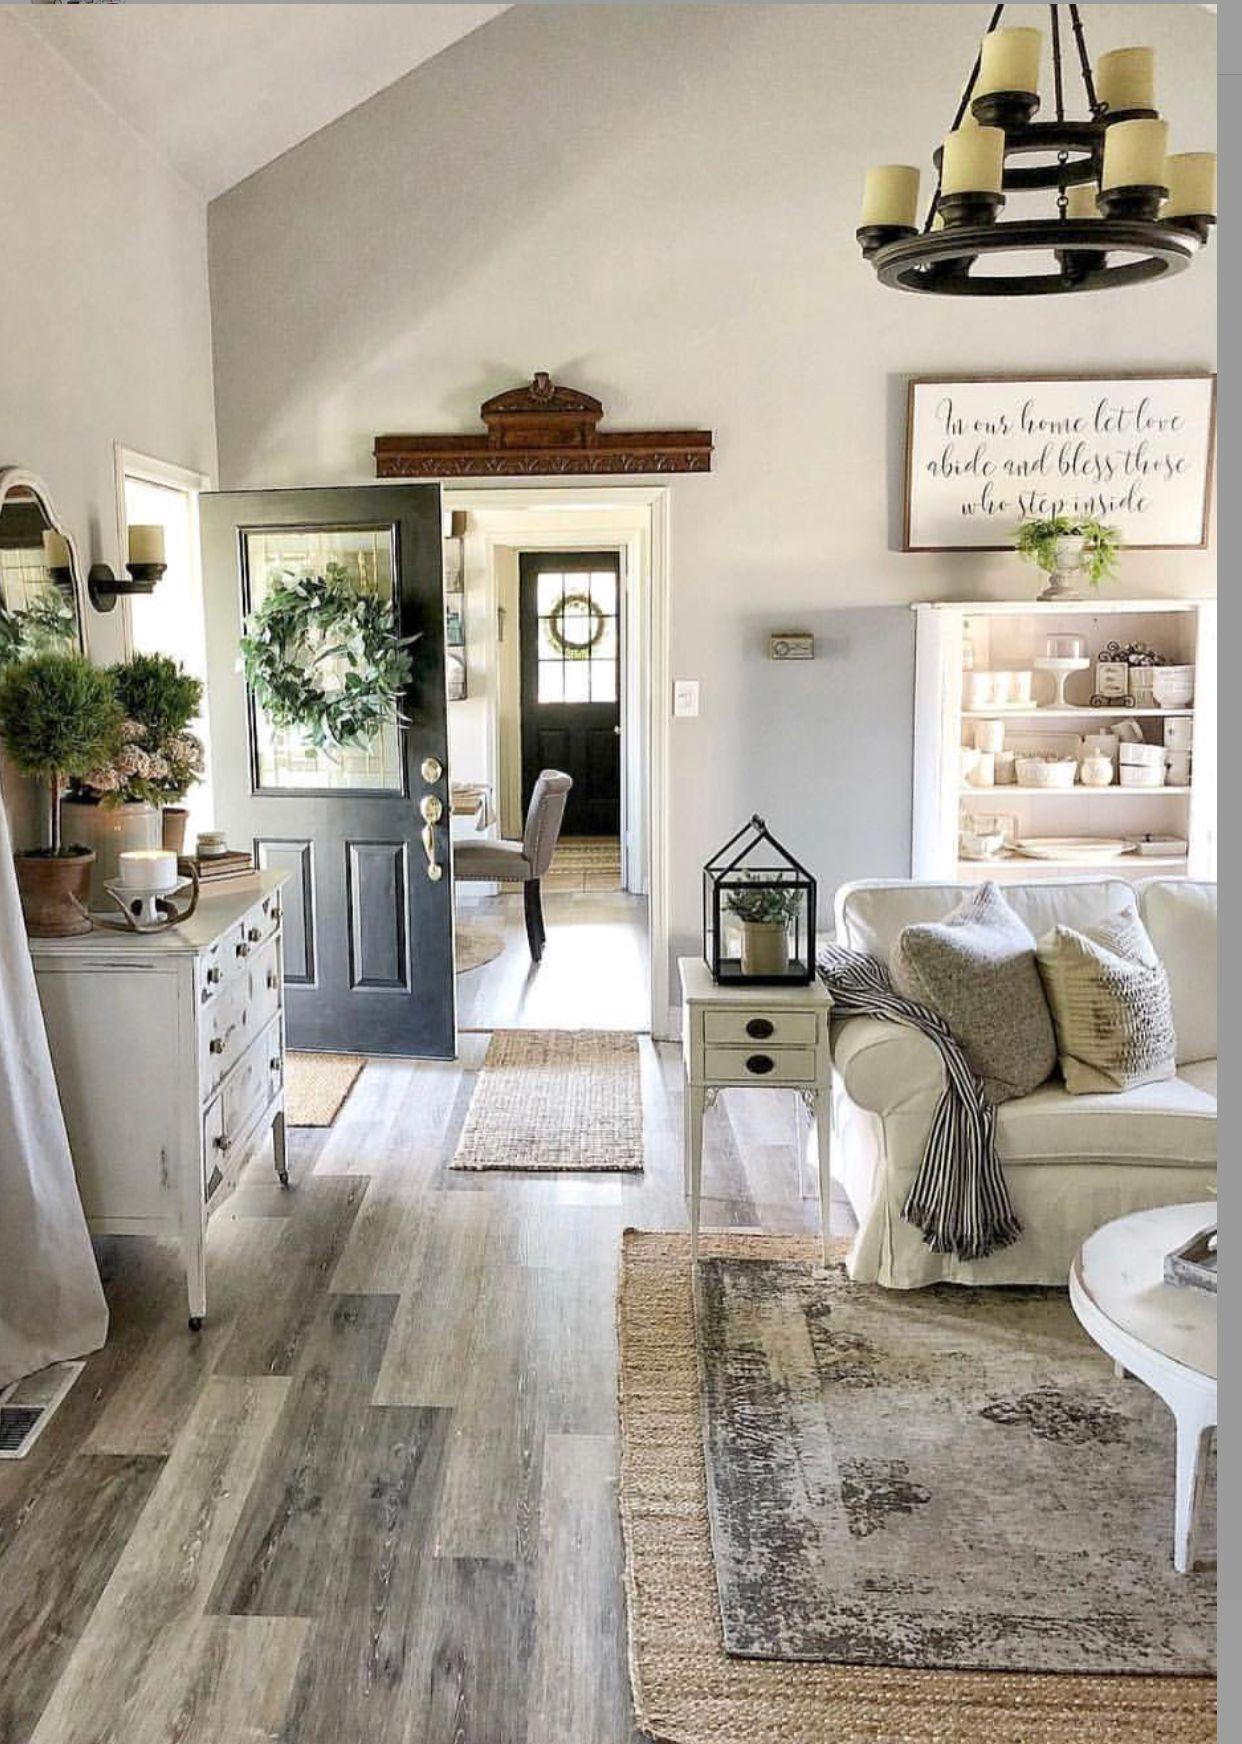 Farmhouse Home Decor Ideas: Pin By Noreen Kennedy On Farmhouse